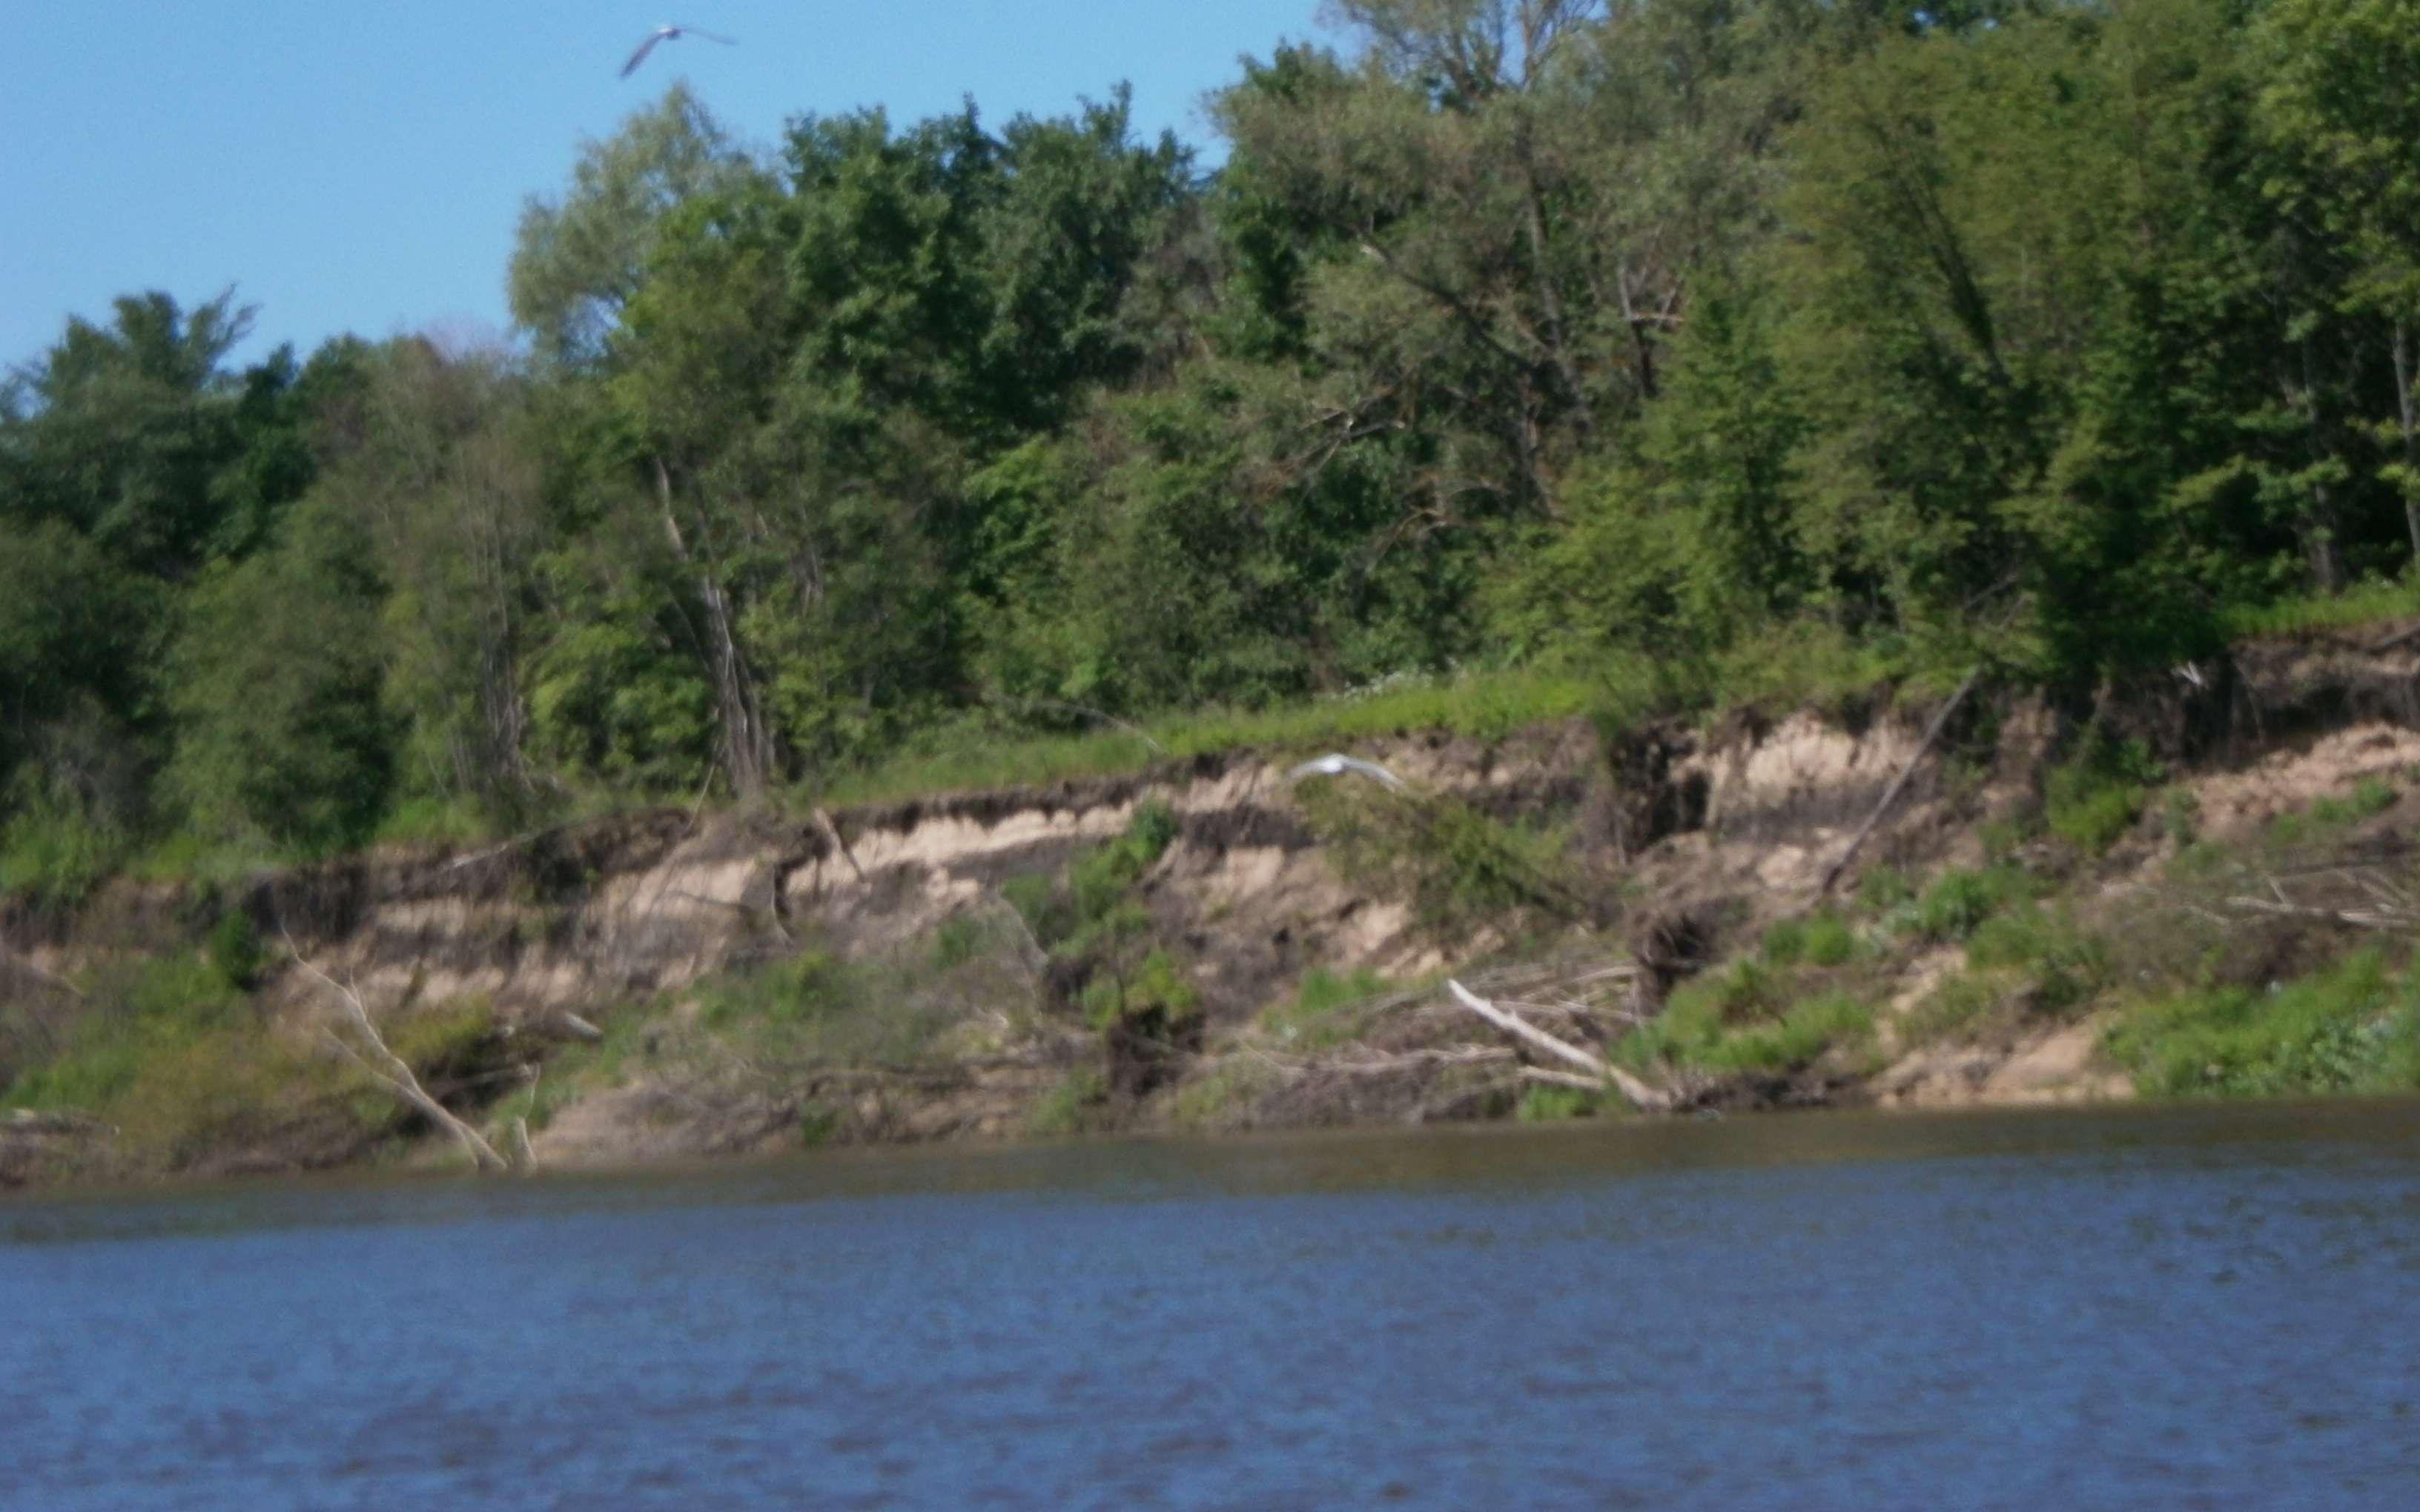 рыбалка на реке с средним течением